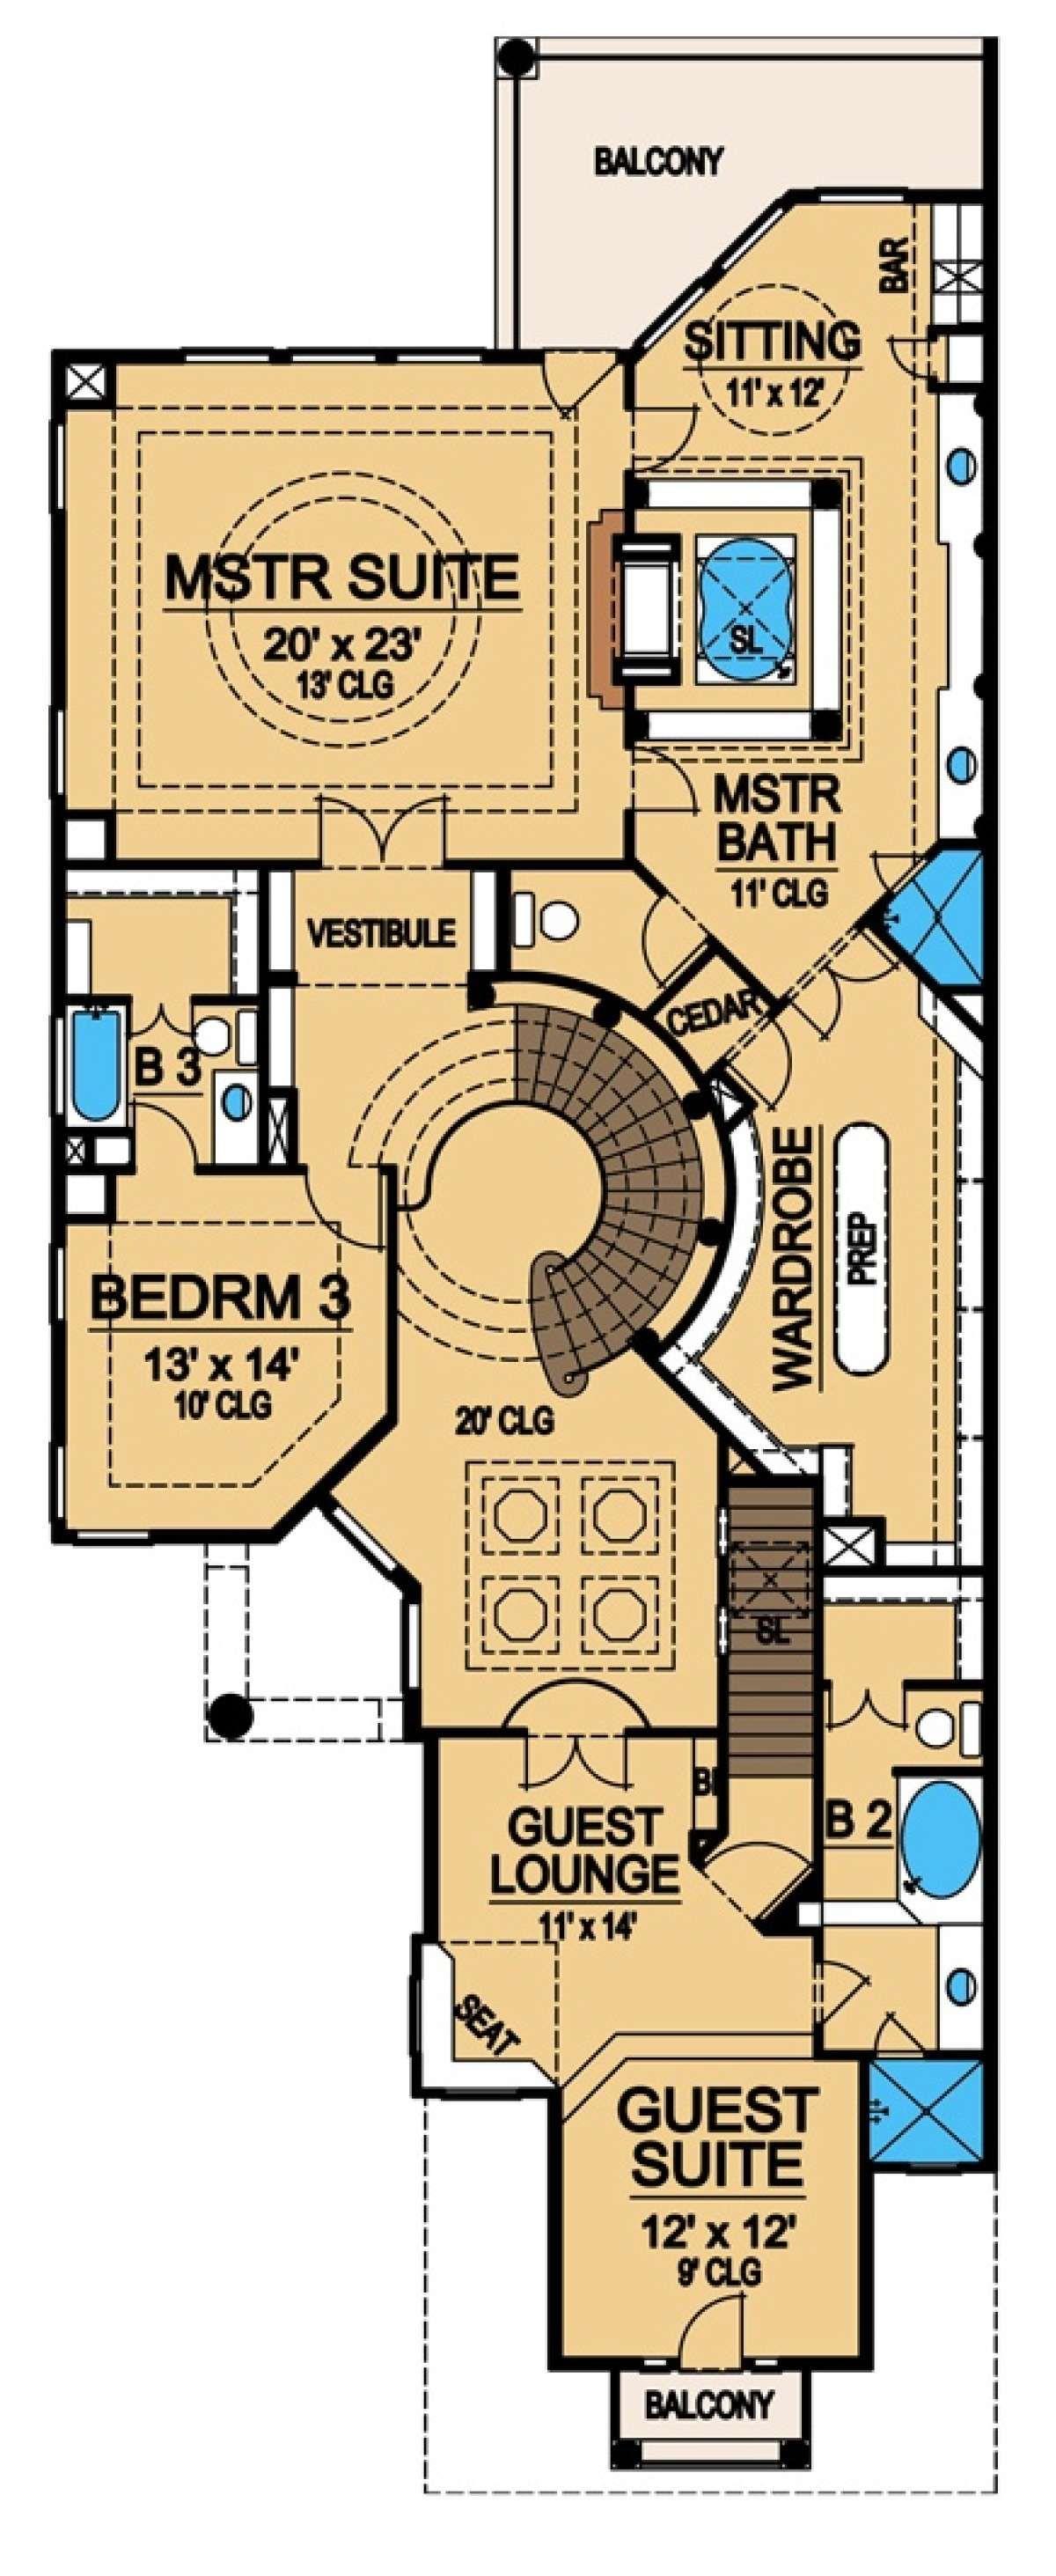 House Plan 5445 00217 Luxury Plan 4 281 Square Feet 3 Bedrooms 3 5 Bathrooms Narrow House Plans Luxury Plan House Plans